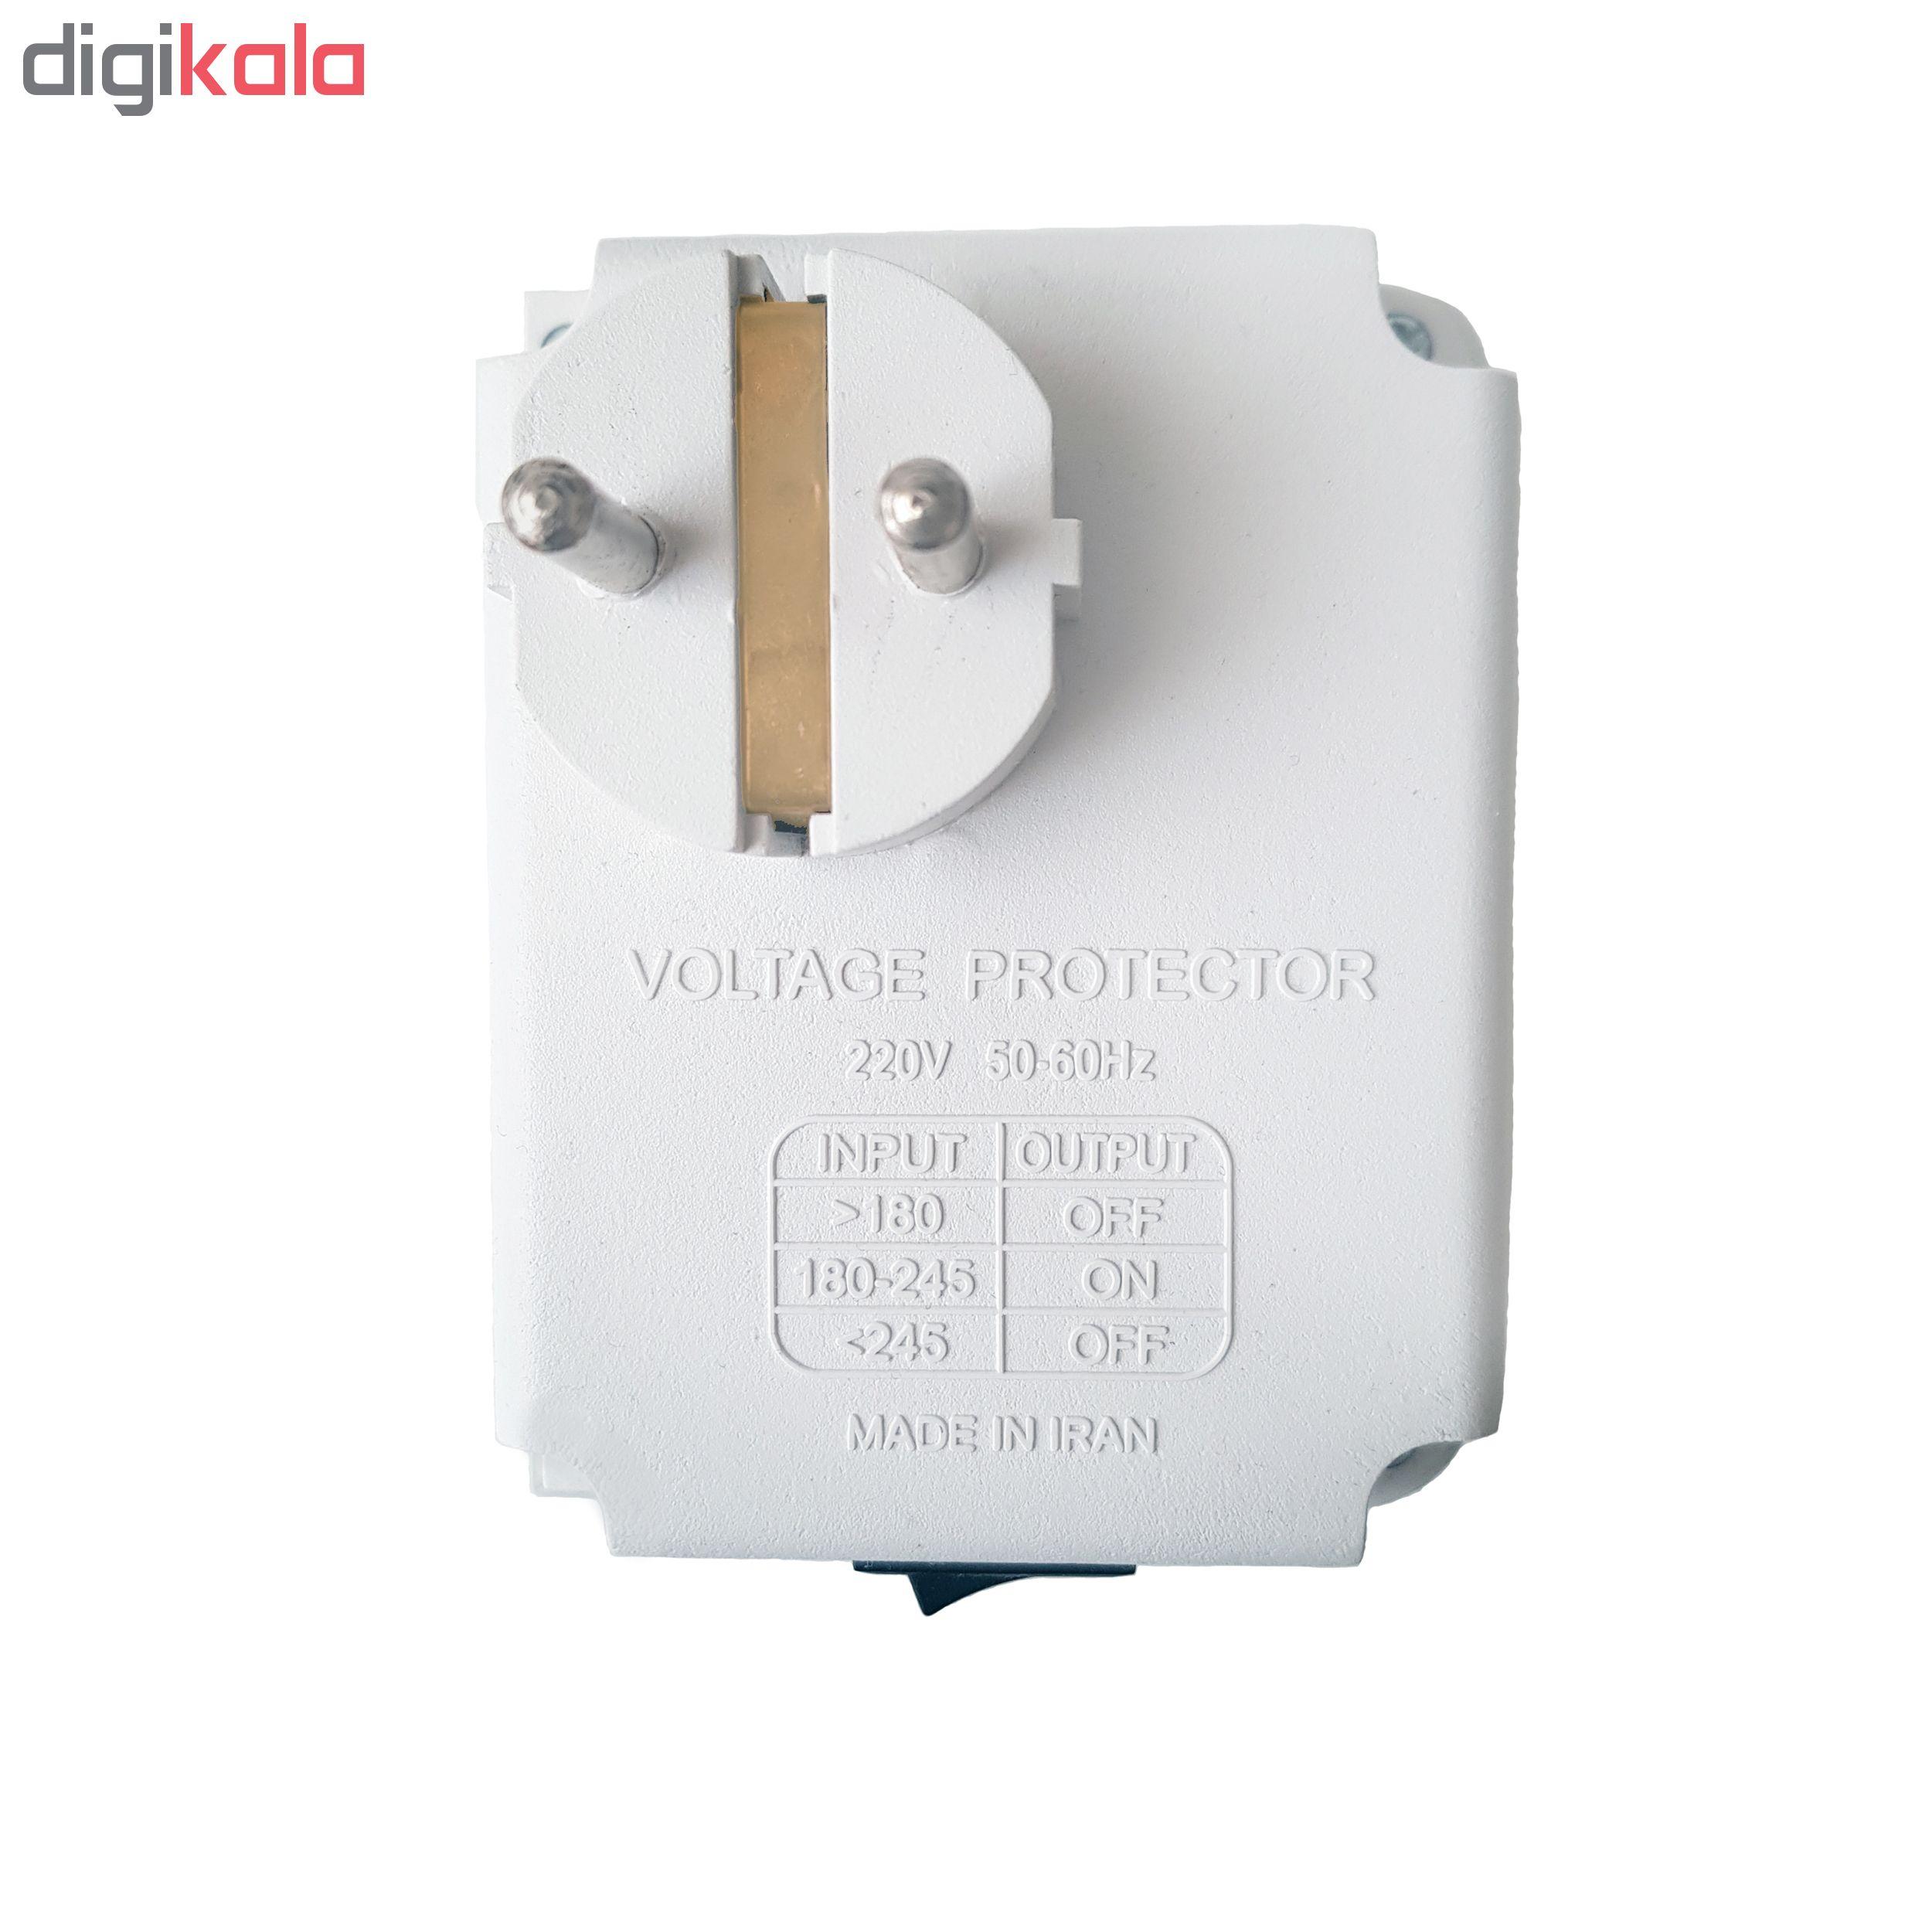 محافظ ولتاژ آریا مدل 1001